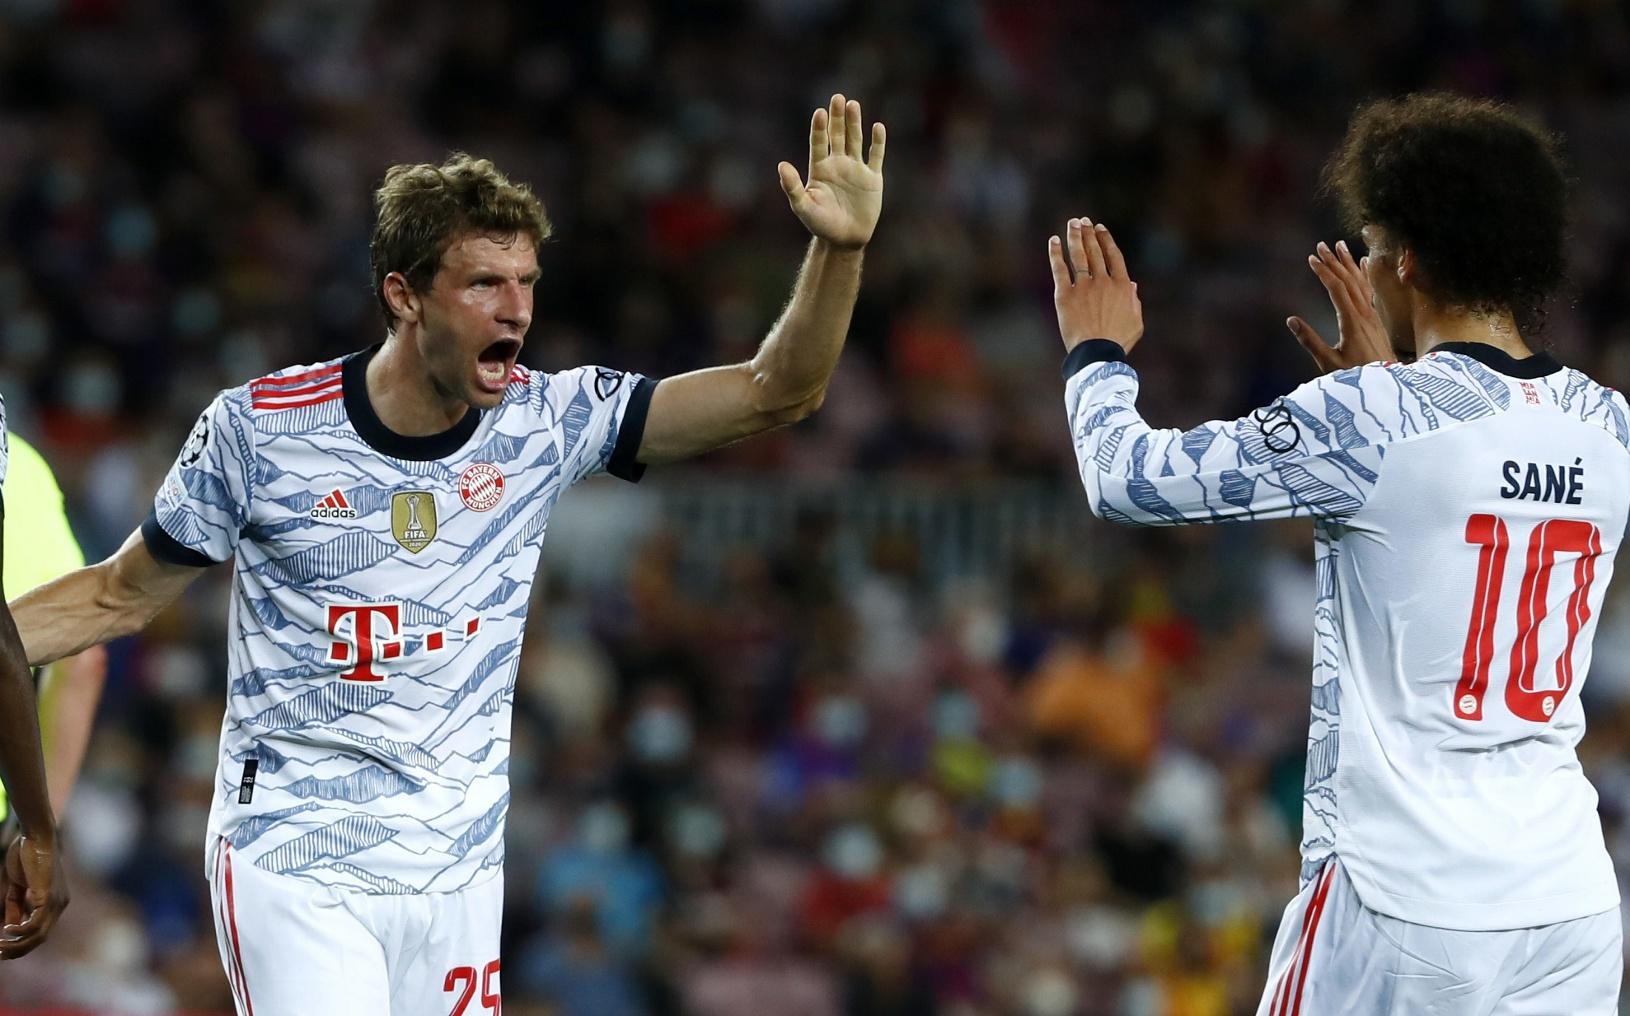 Futbalista Bayernu Thomas Müller